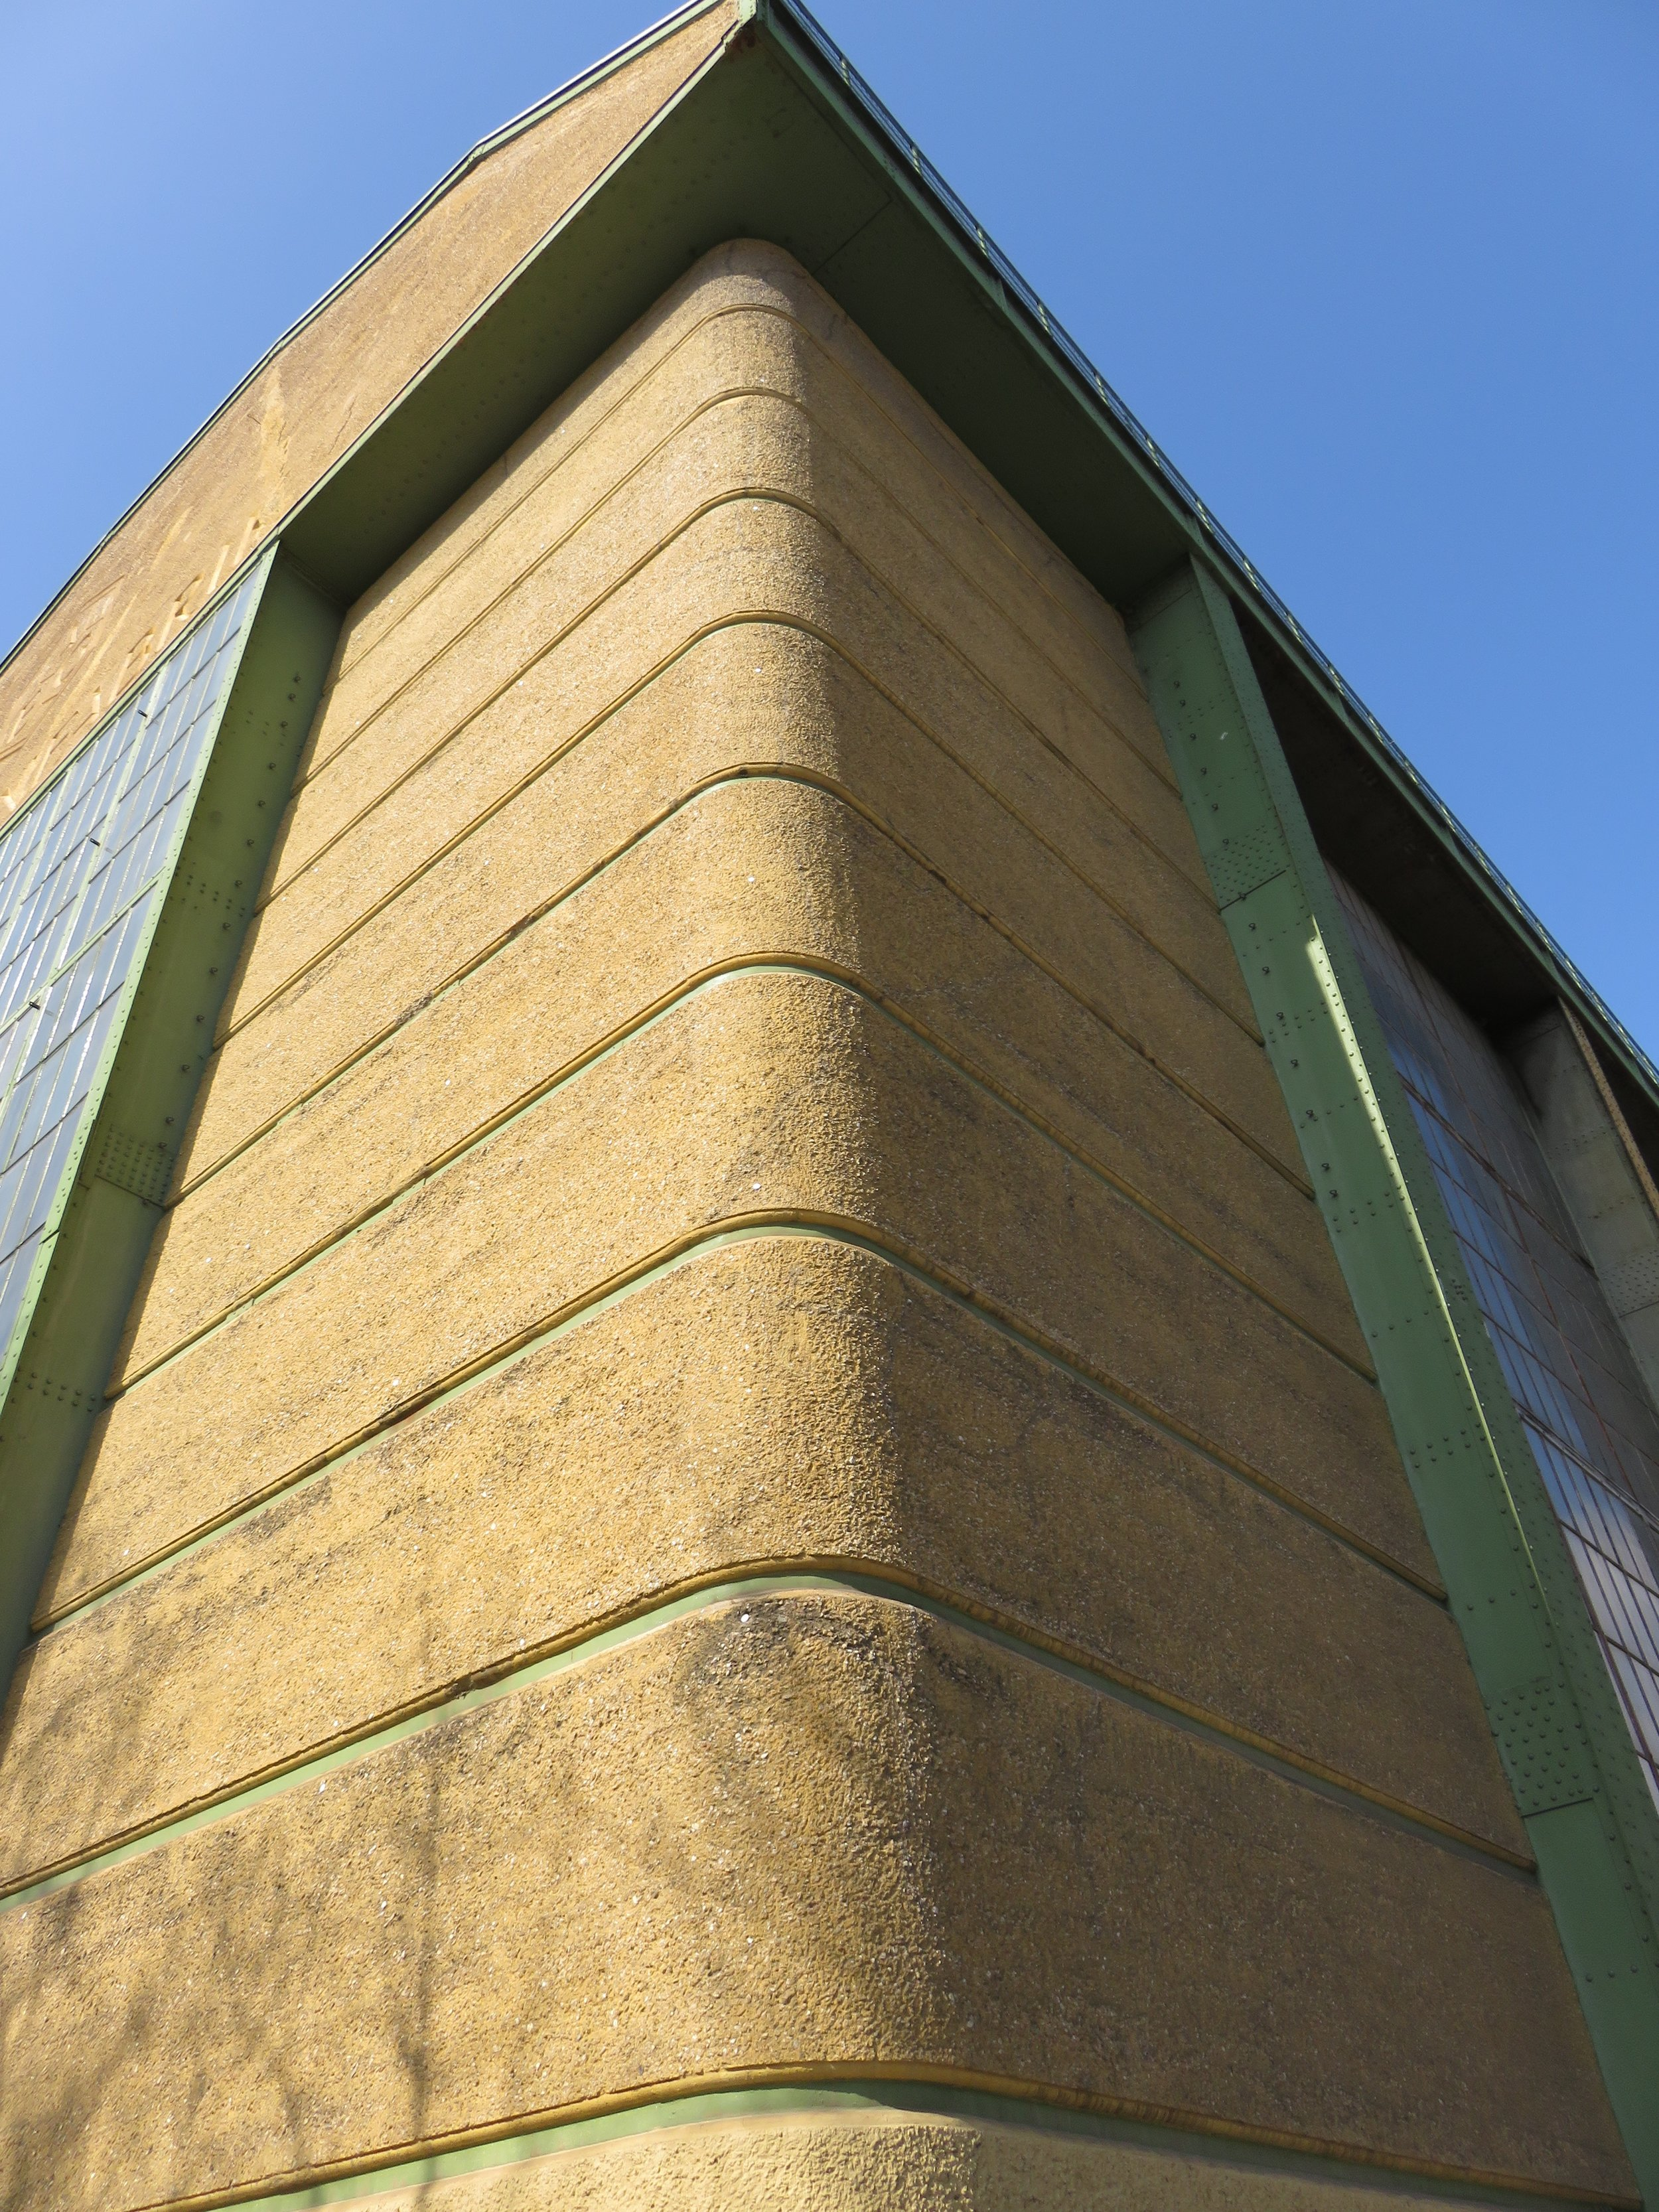 Concrete cornerstones at the Turbinenfabrik